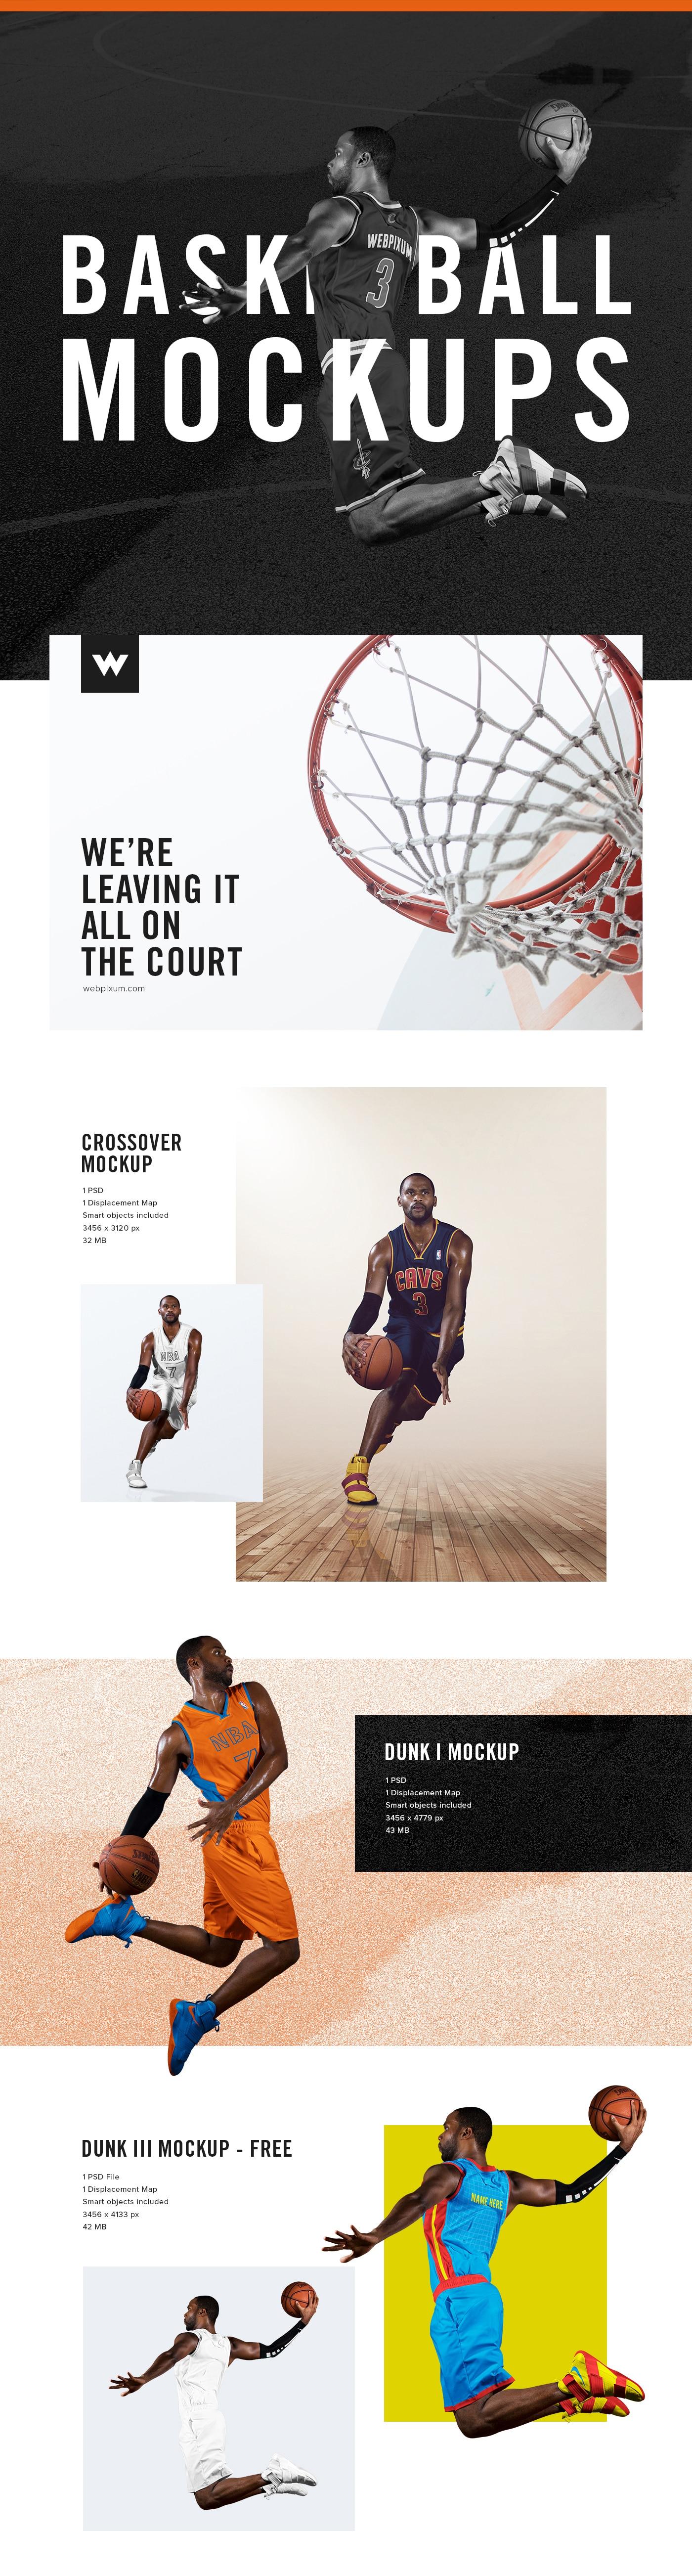 NBA Basketball Dunk